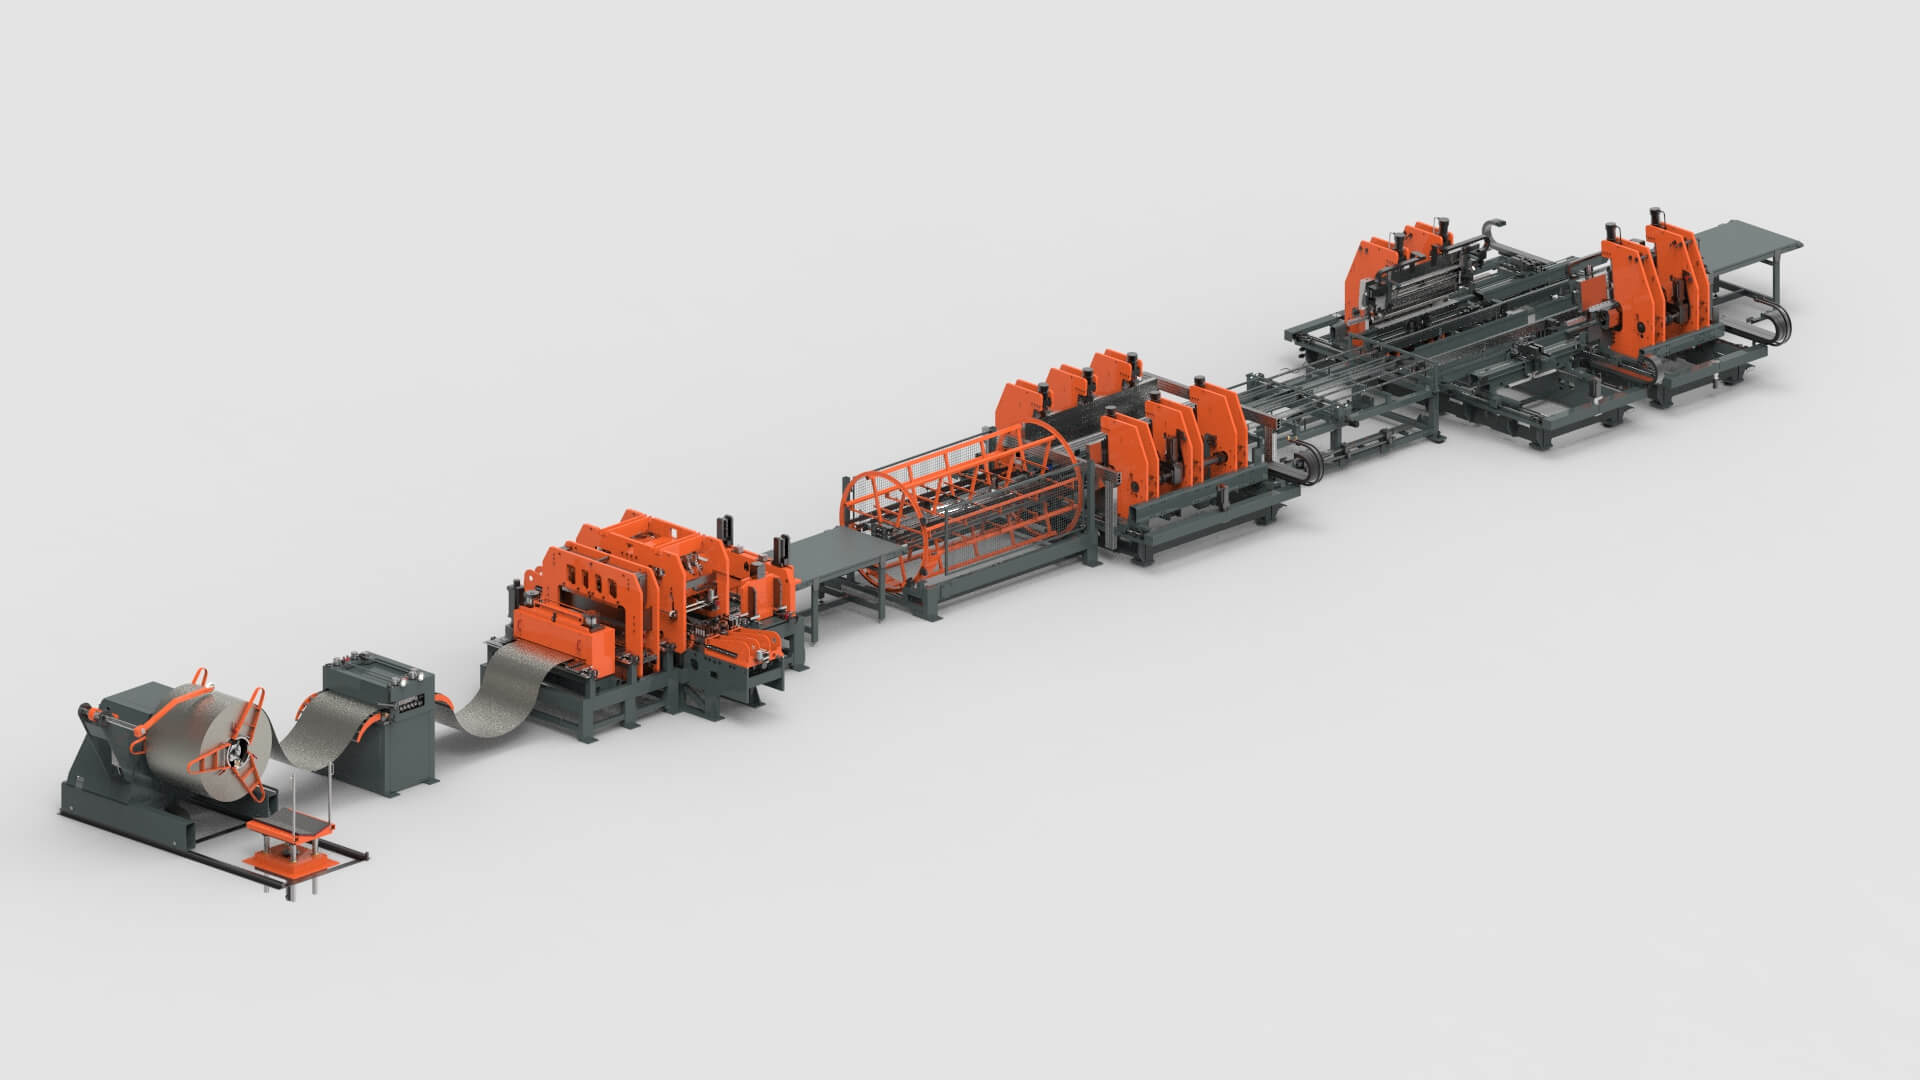 wemo-steel-cabinets-sheet-metal-coil-punching-bending-production-line.jpg